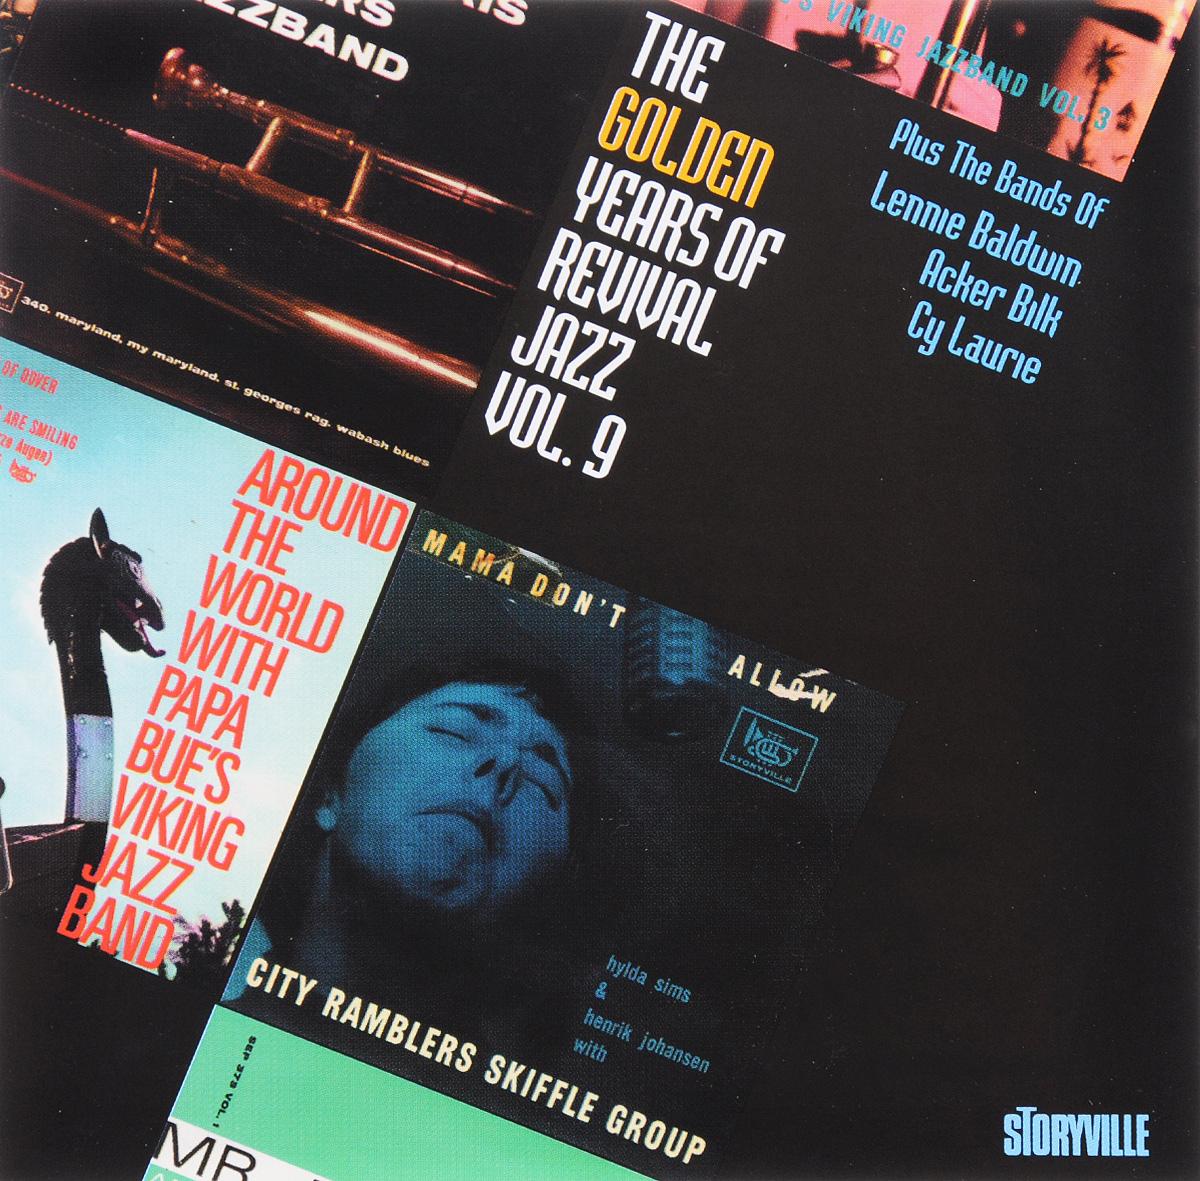 Chris Barber's Jazz Band,Papa Bue's Viking Jazz Band,